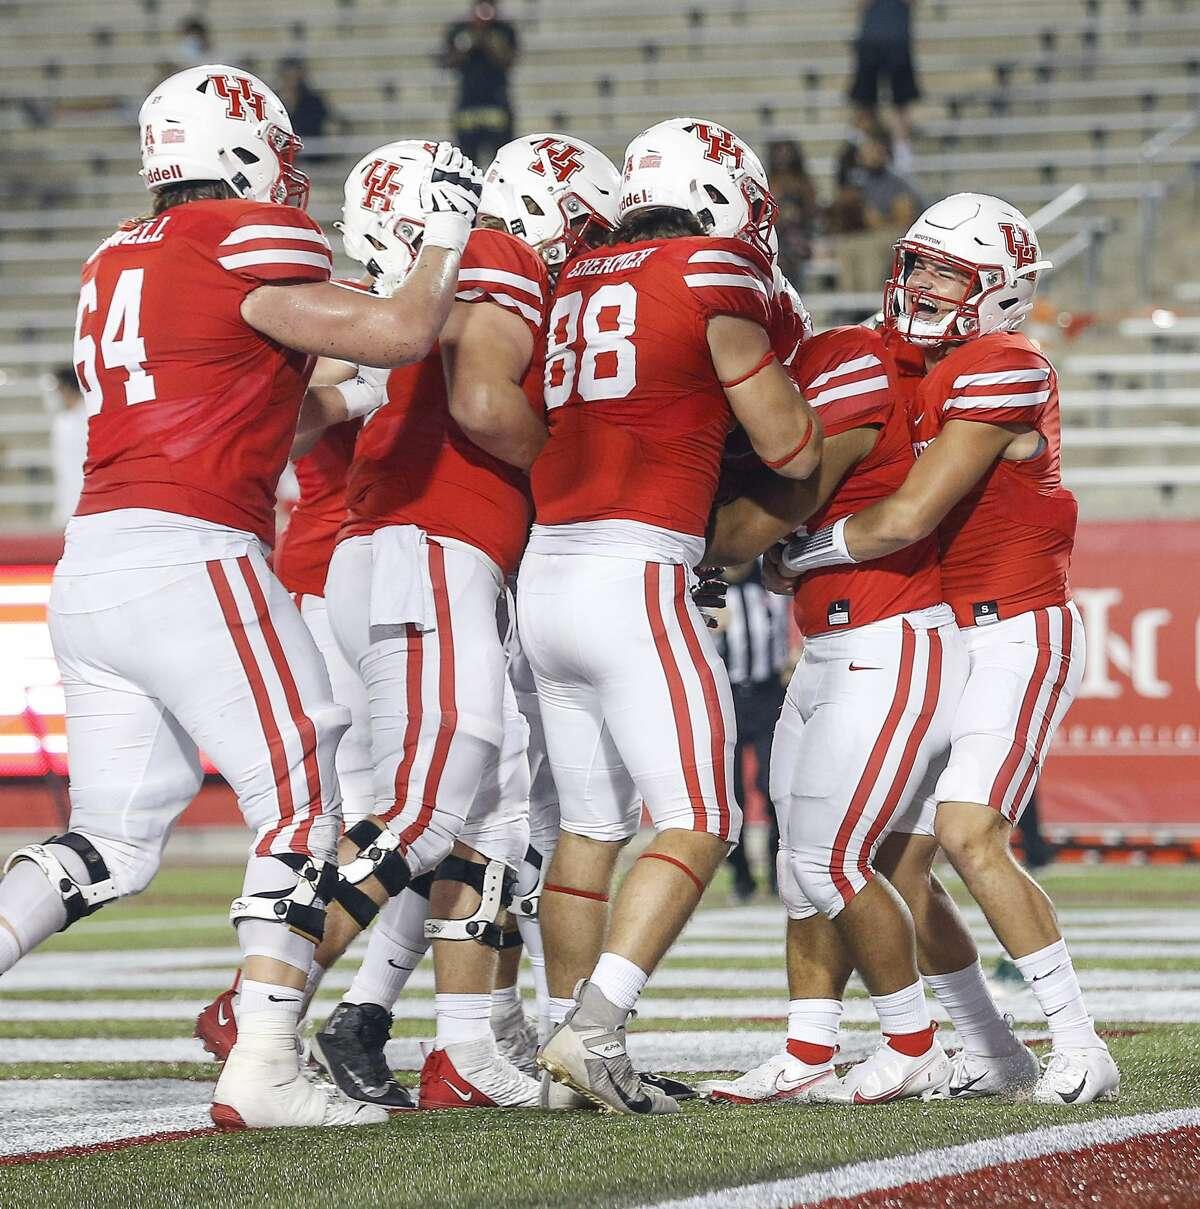 Houston Cougars quarterback Logan Holgorsen (6) celebrates with teammates after Houston Cougars Jame Fullbright, III, (46) scored a touchdown during the fourth quarter of an NCAA football game Saturday, Nov. 14, 2020, at TDECU Stadium in Houston.